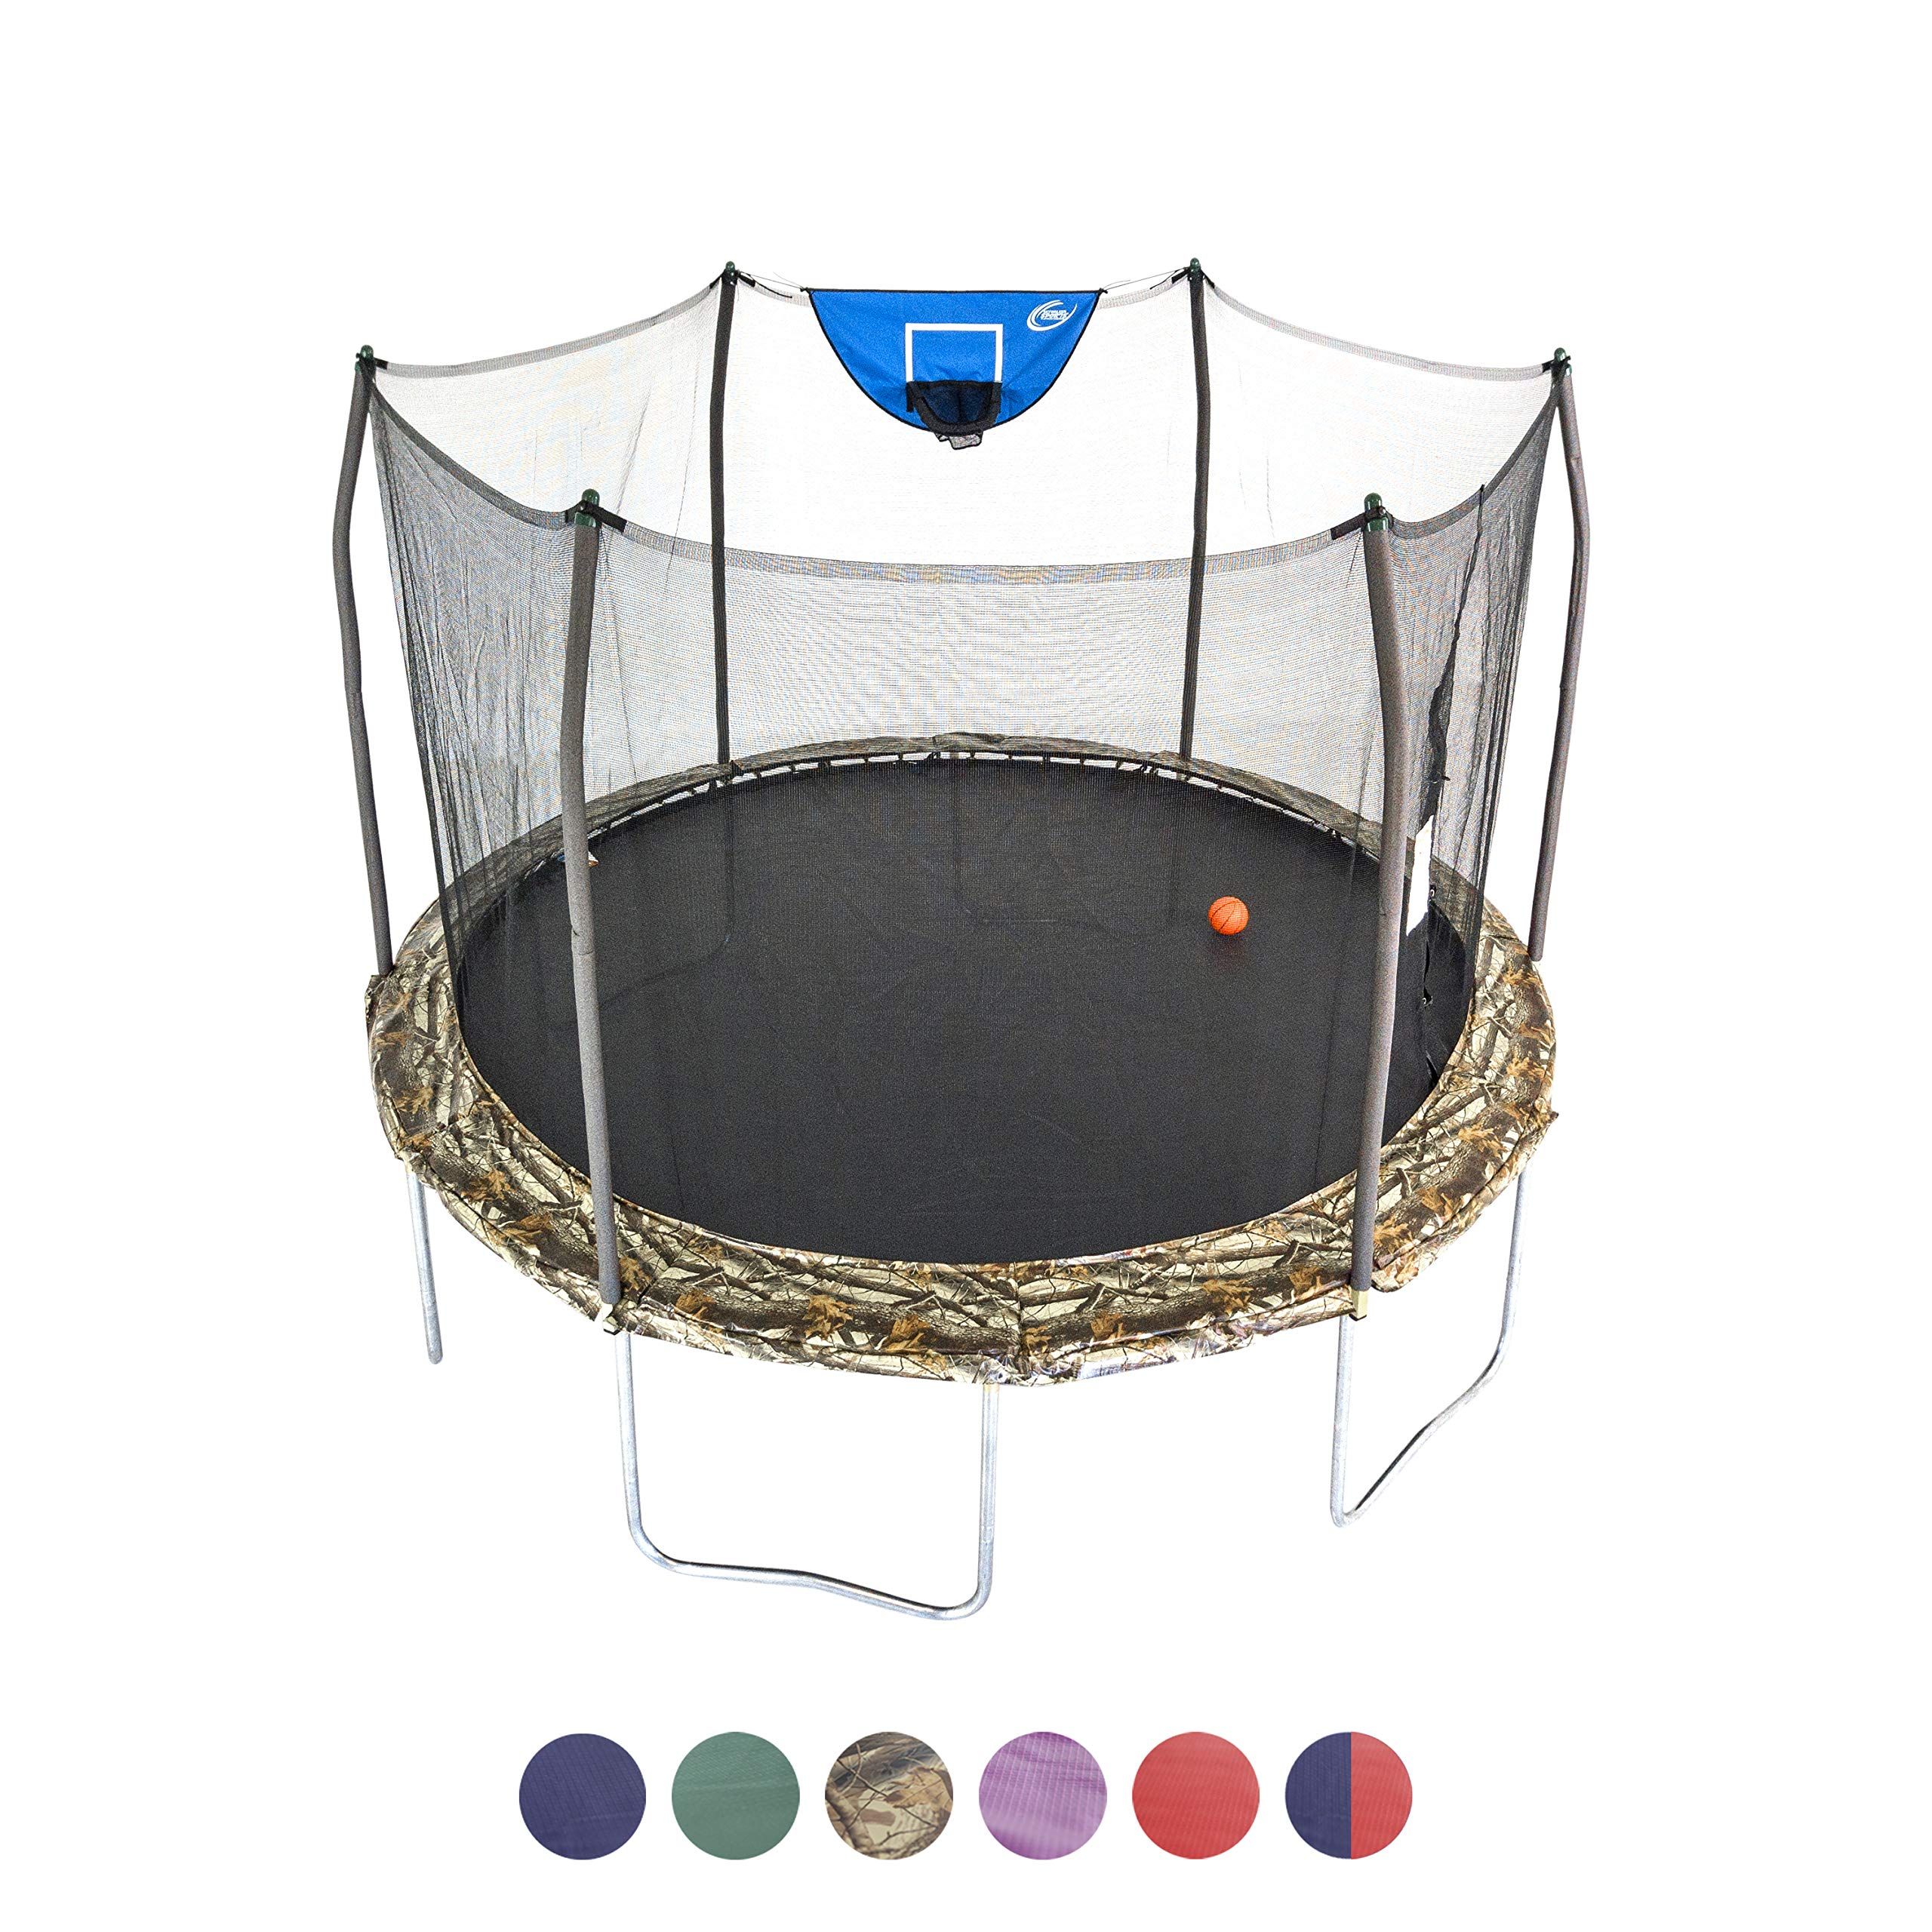 Skywalker Trampolines Trampoline Enclosure Basketball